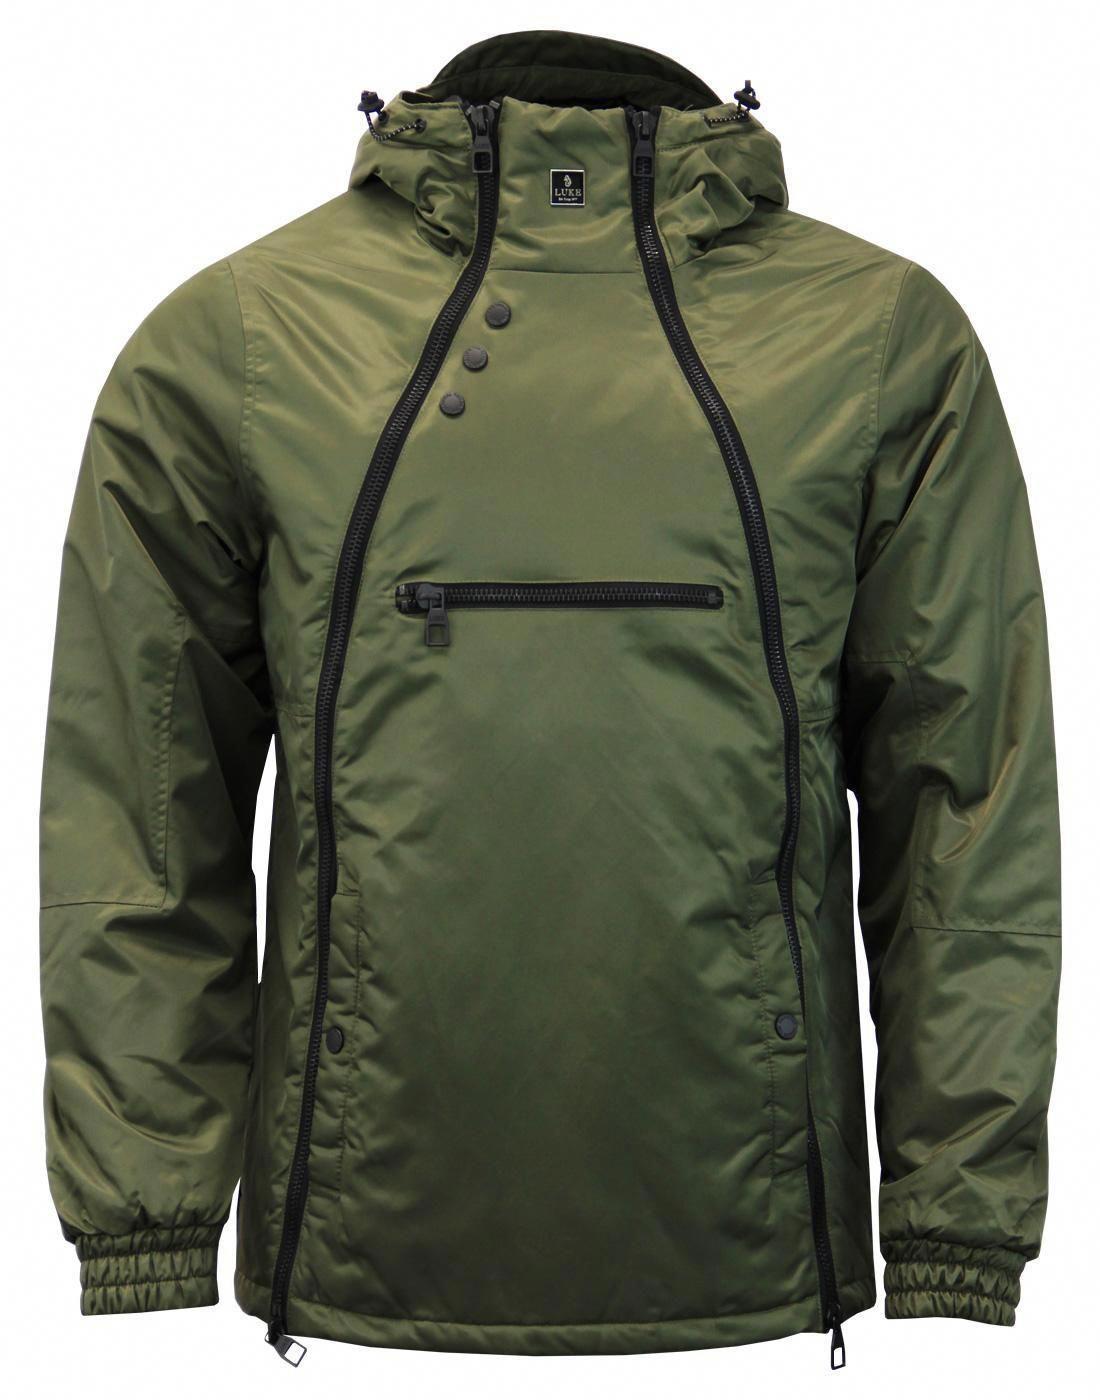 Turvey LUKE 1977 Men's Double Zip Technical Jacket #jacket